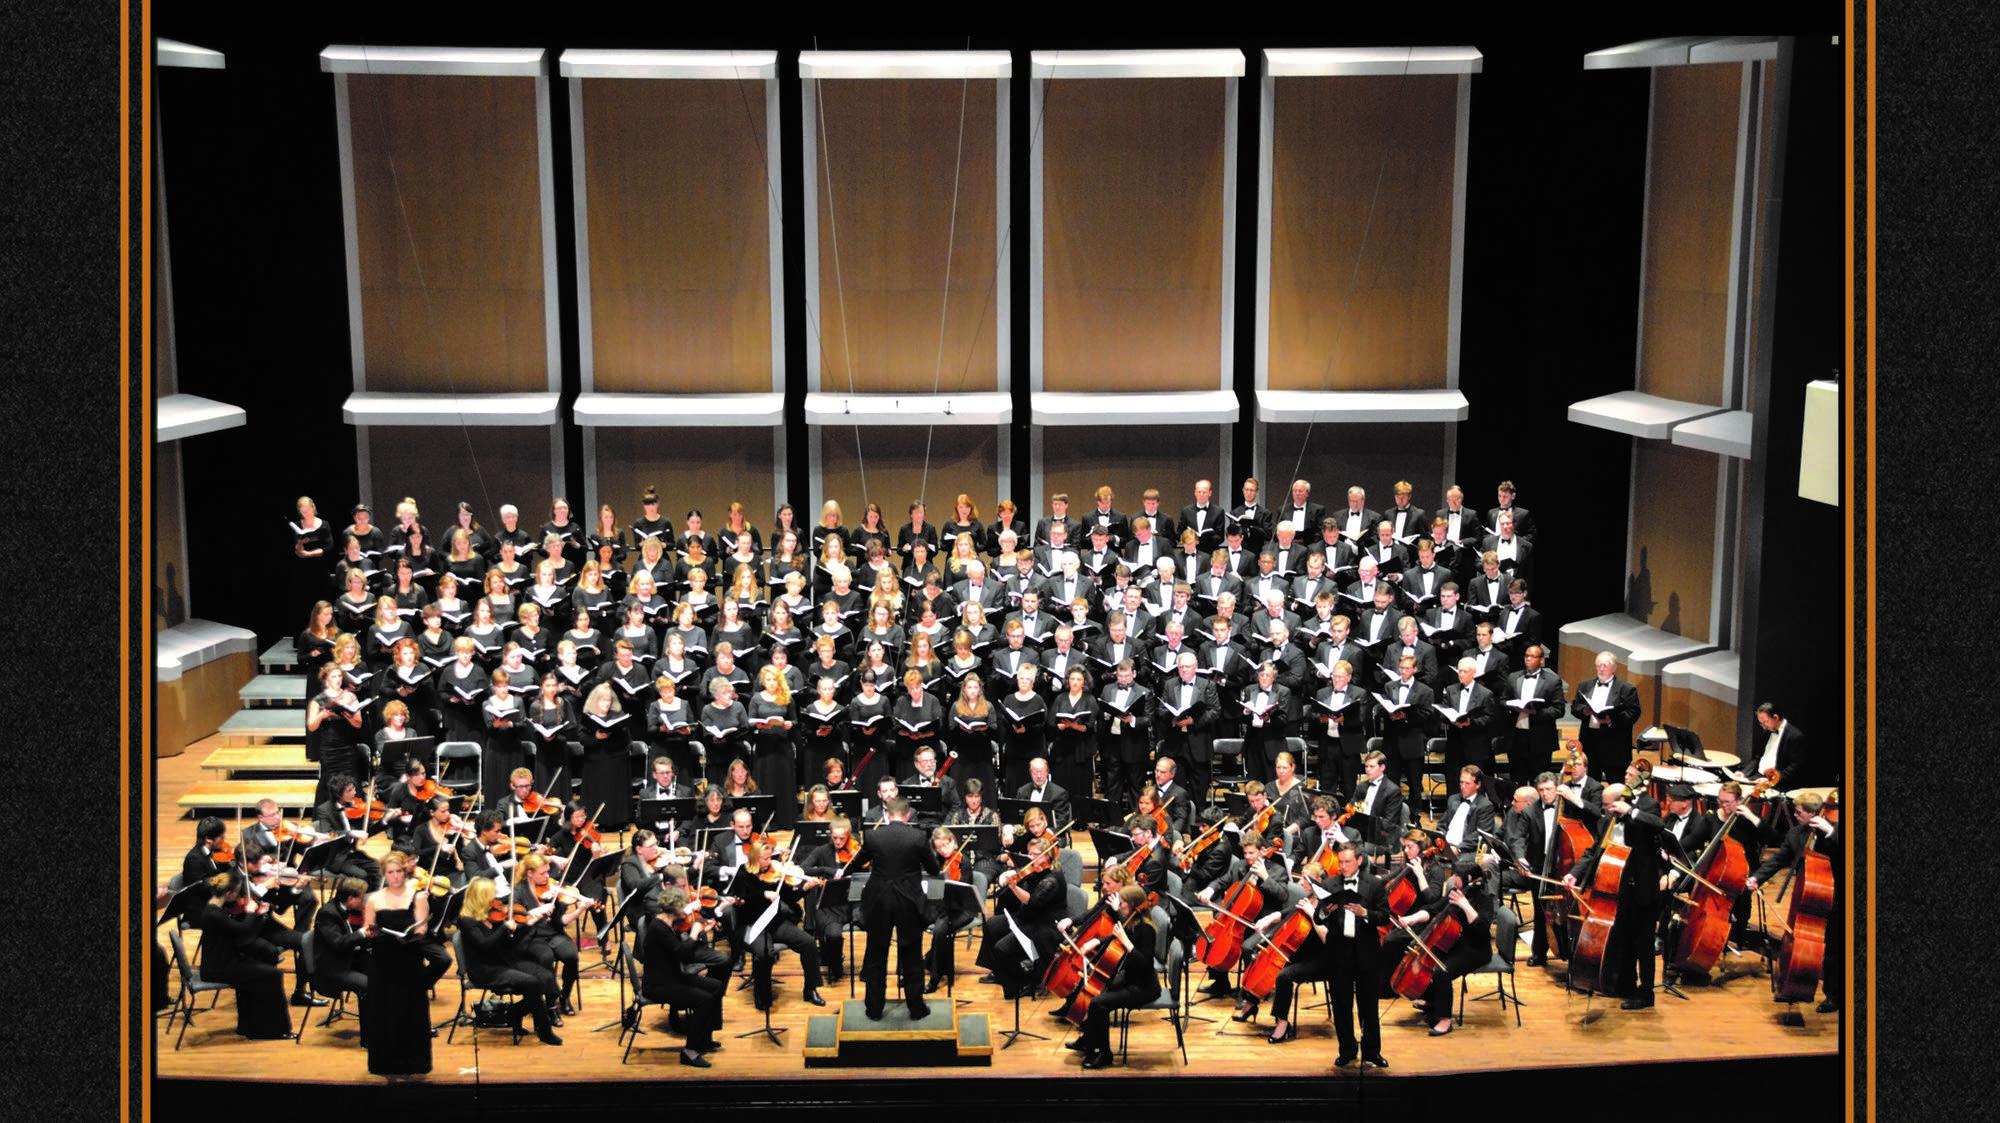 University of Minnesota Symphony Orchestra and choirs.